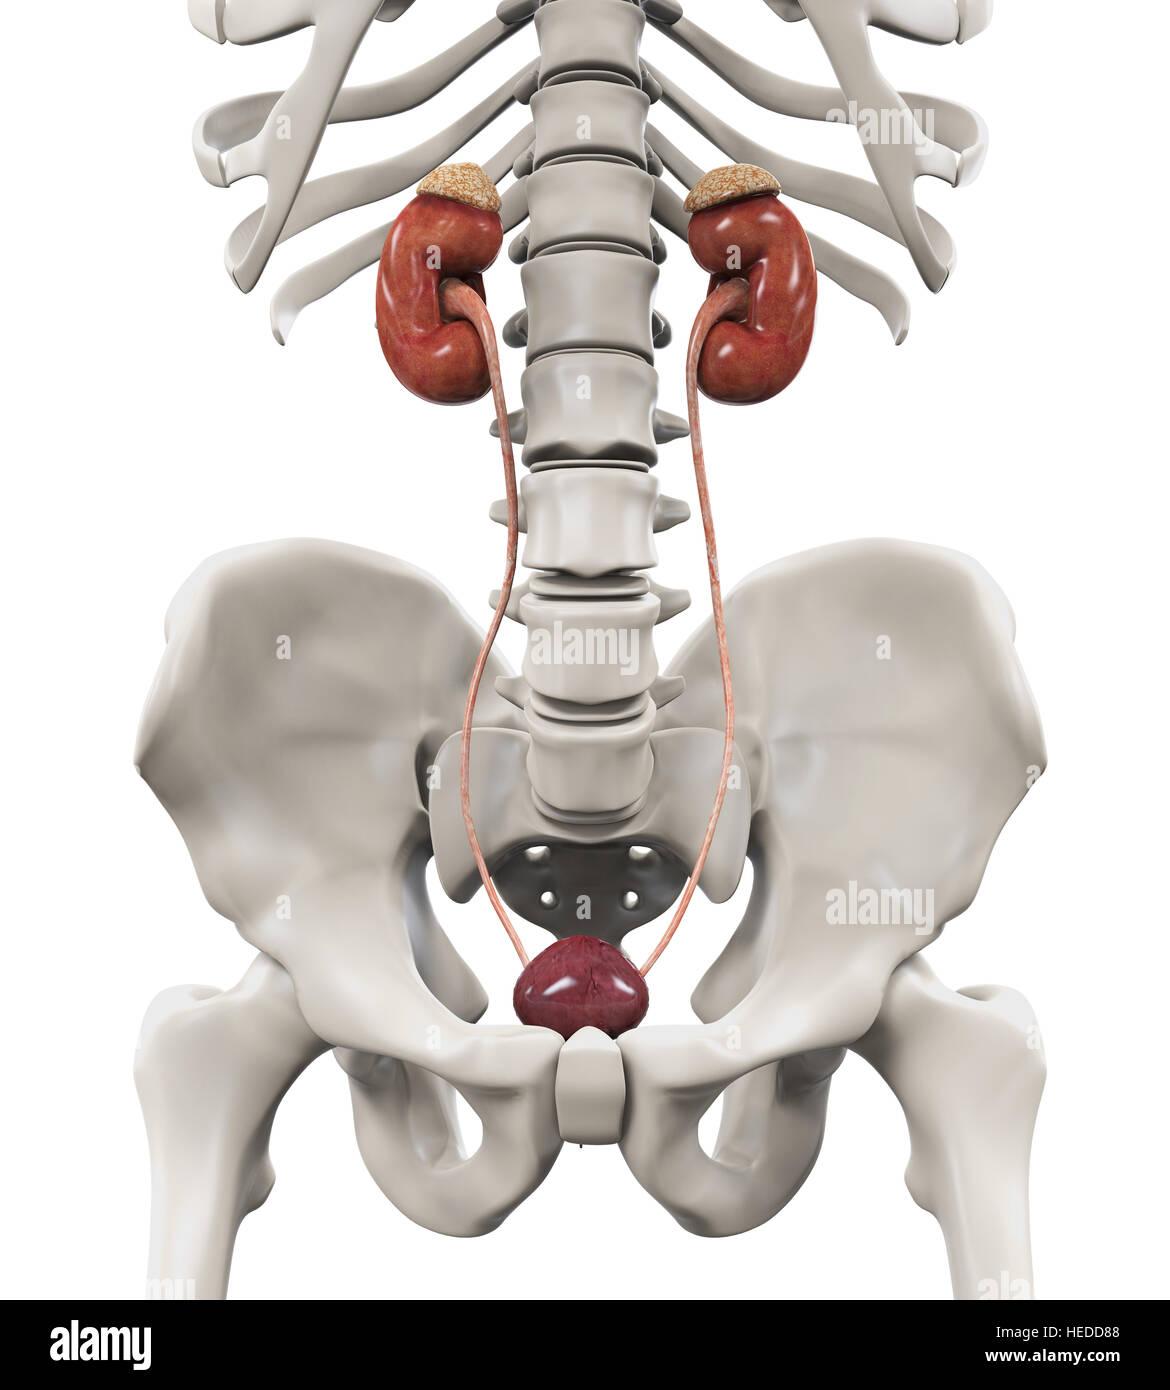 Human Kidneys Anatomy - Stock Image